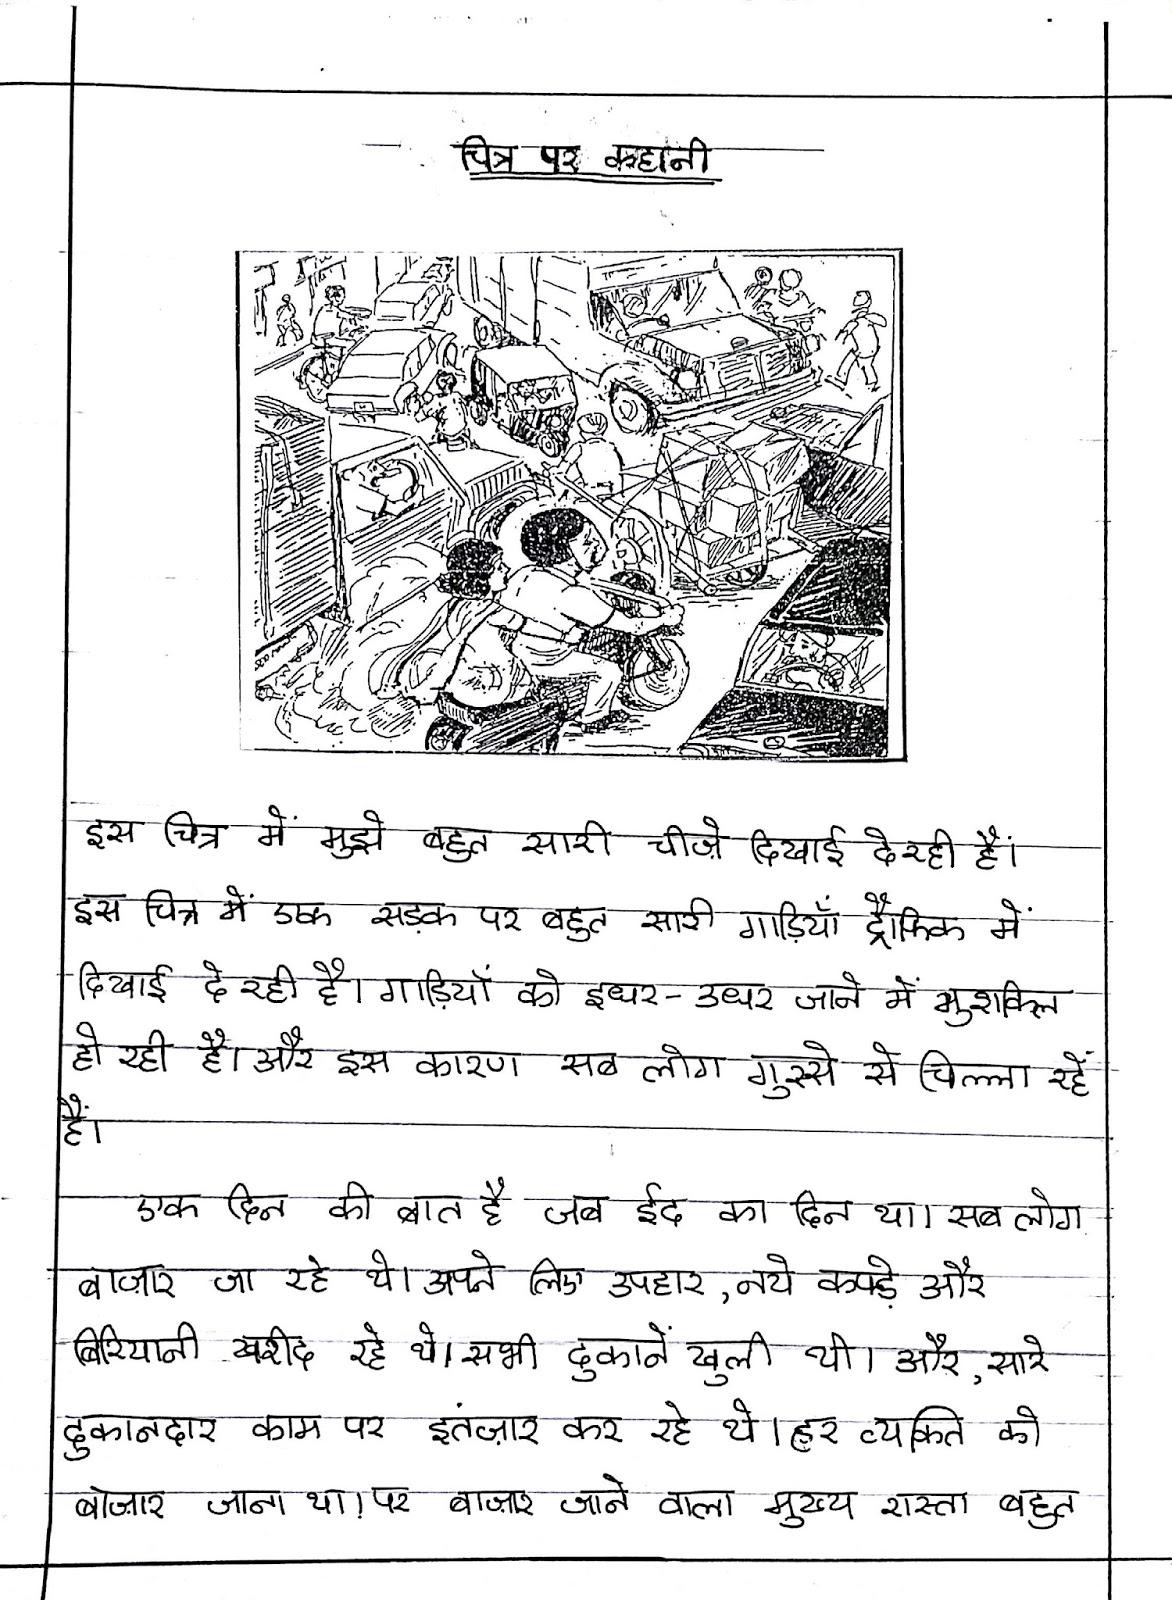 Bachon Ki Kalam Se Traffic Jam Picture Story And Composition